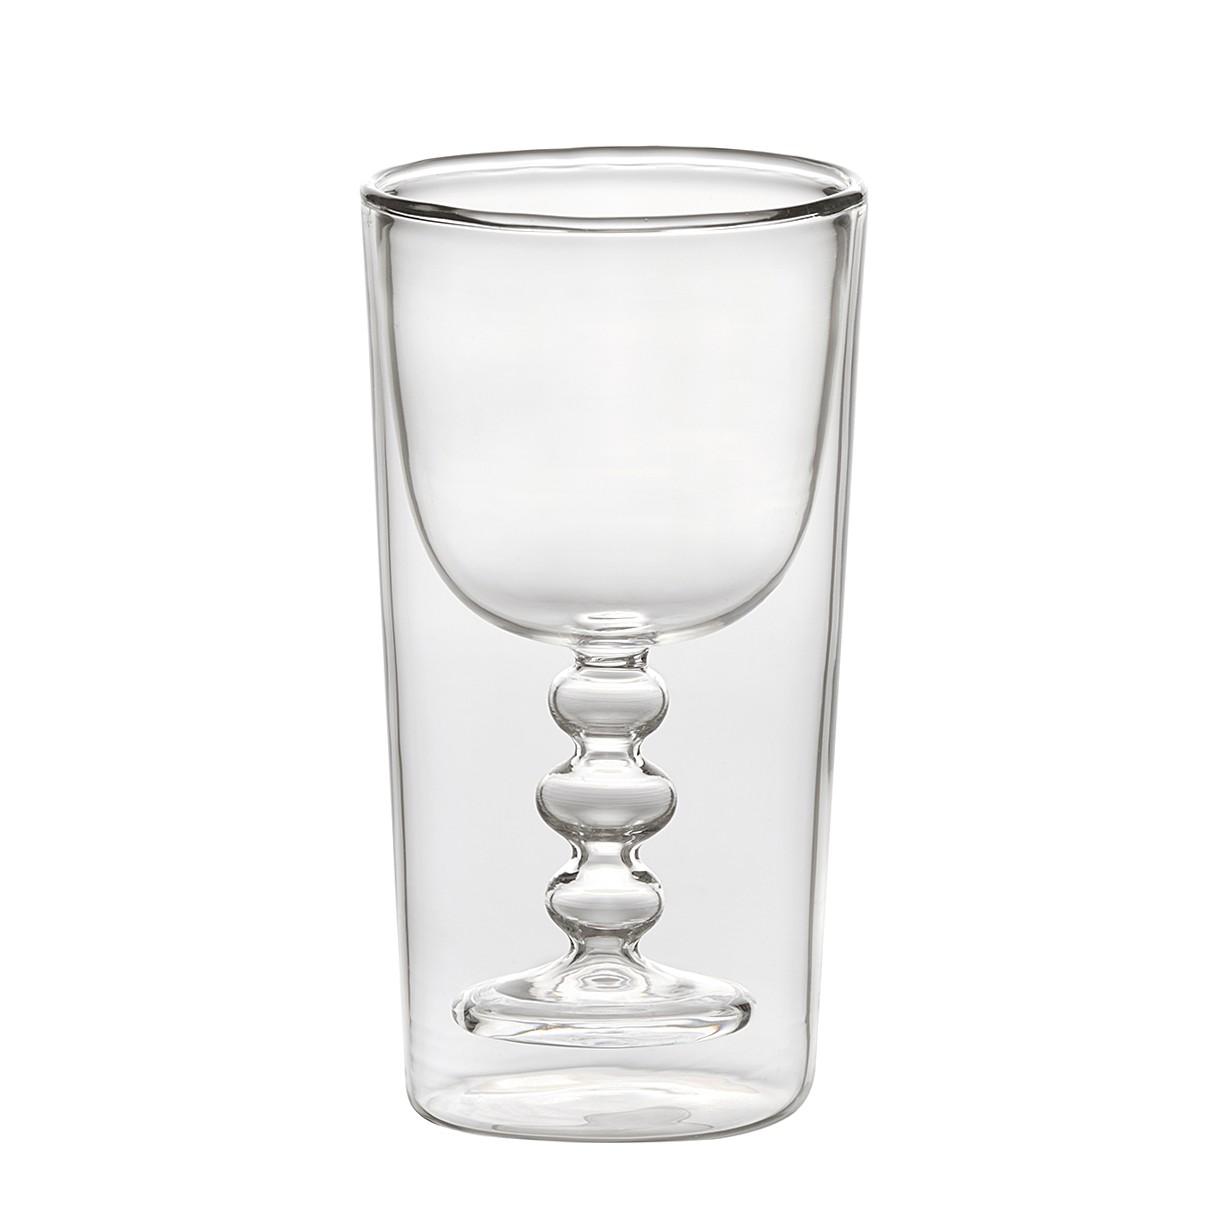 Trinkglas Borosilicate (2er-Set), BITOSSI HOME günstig kaufen